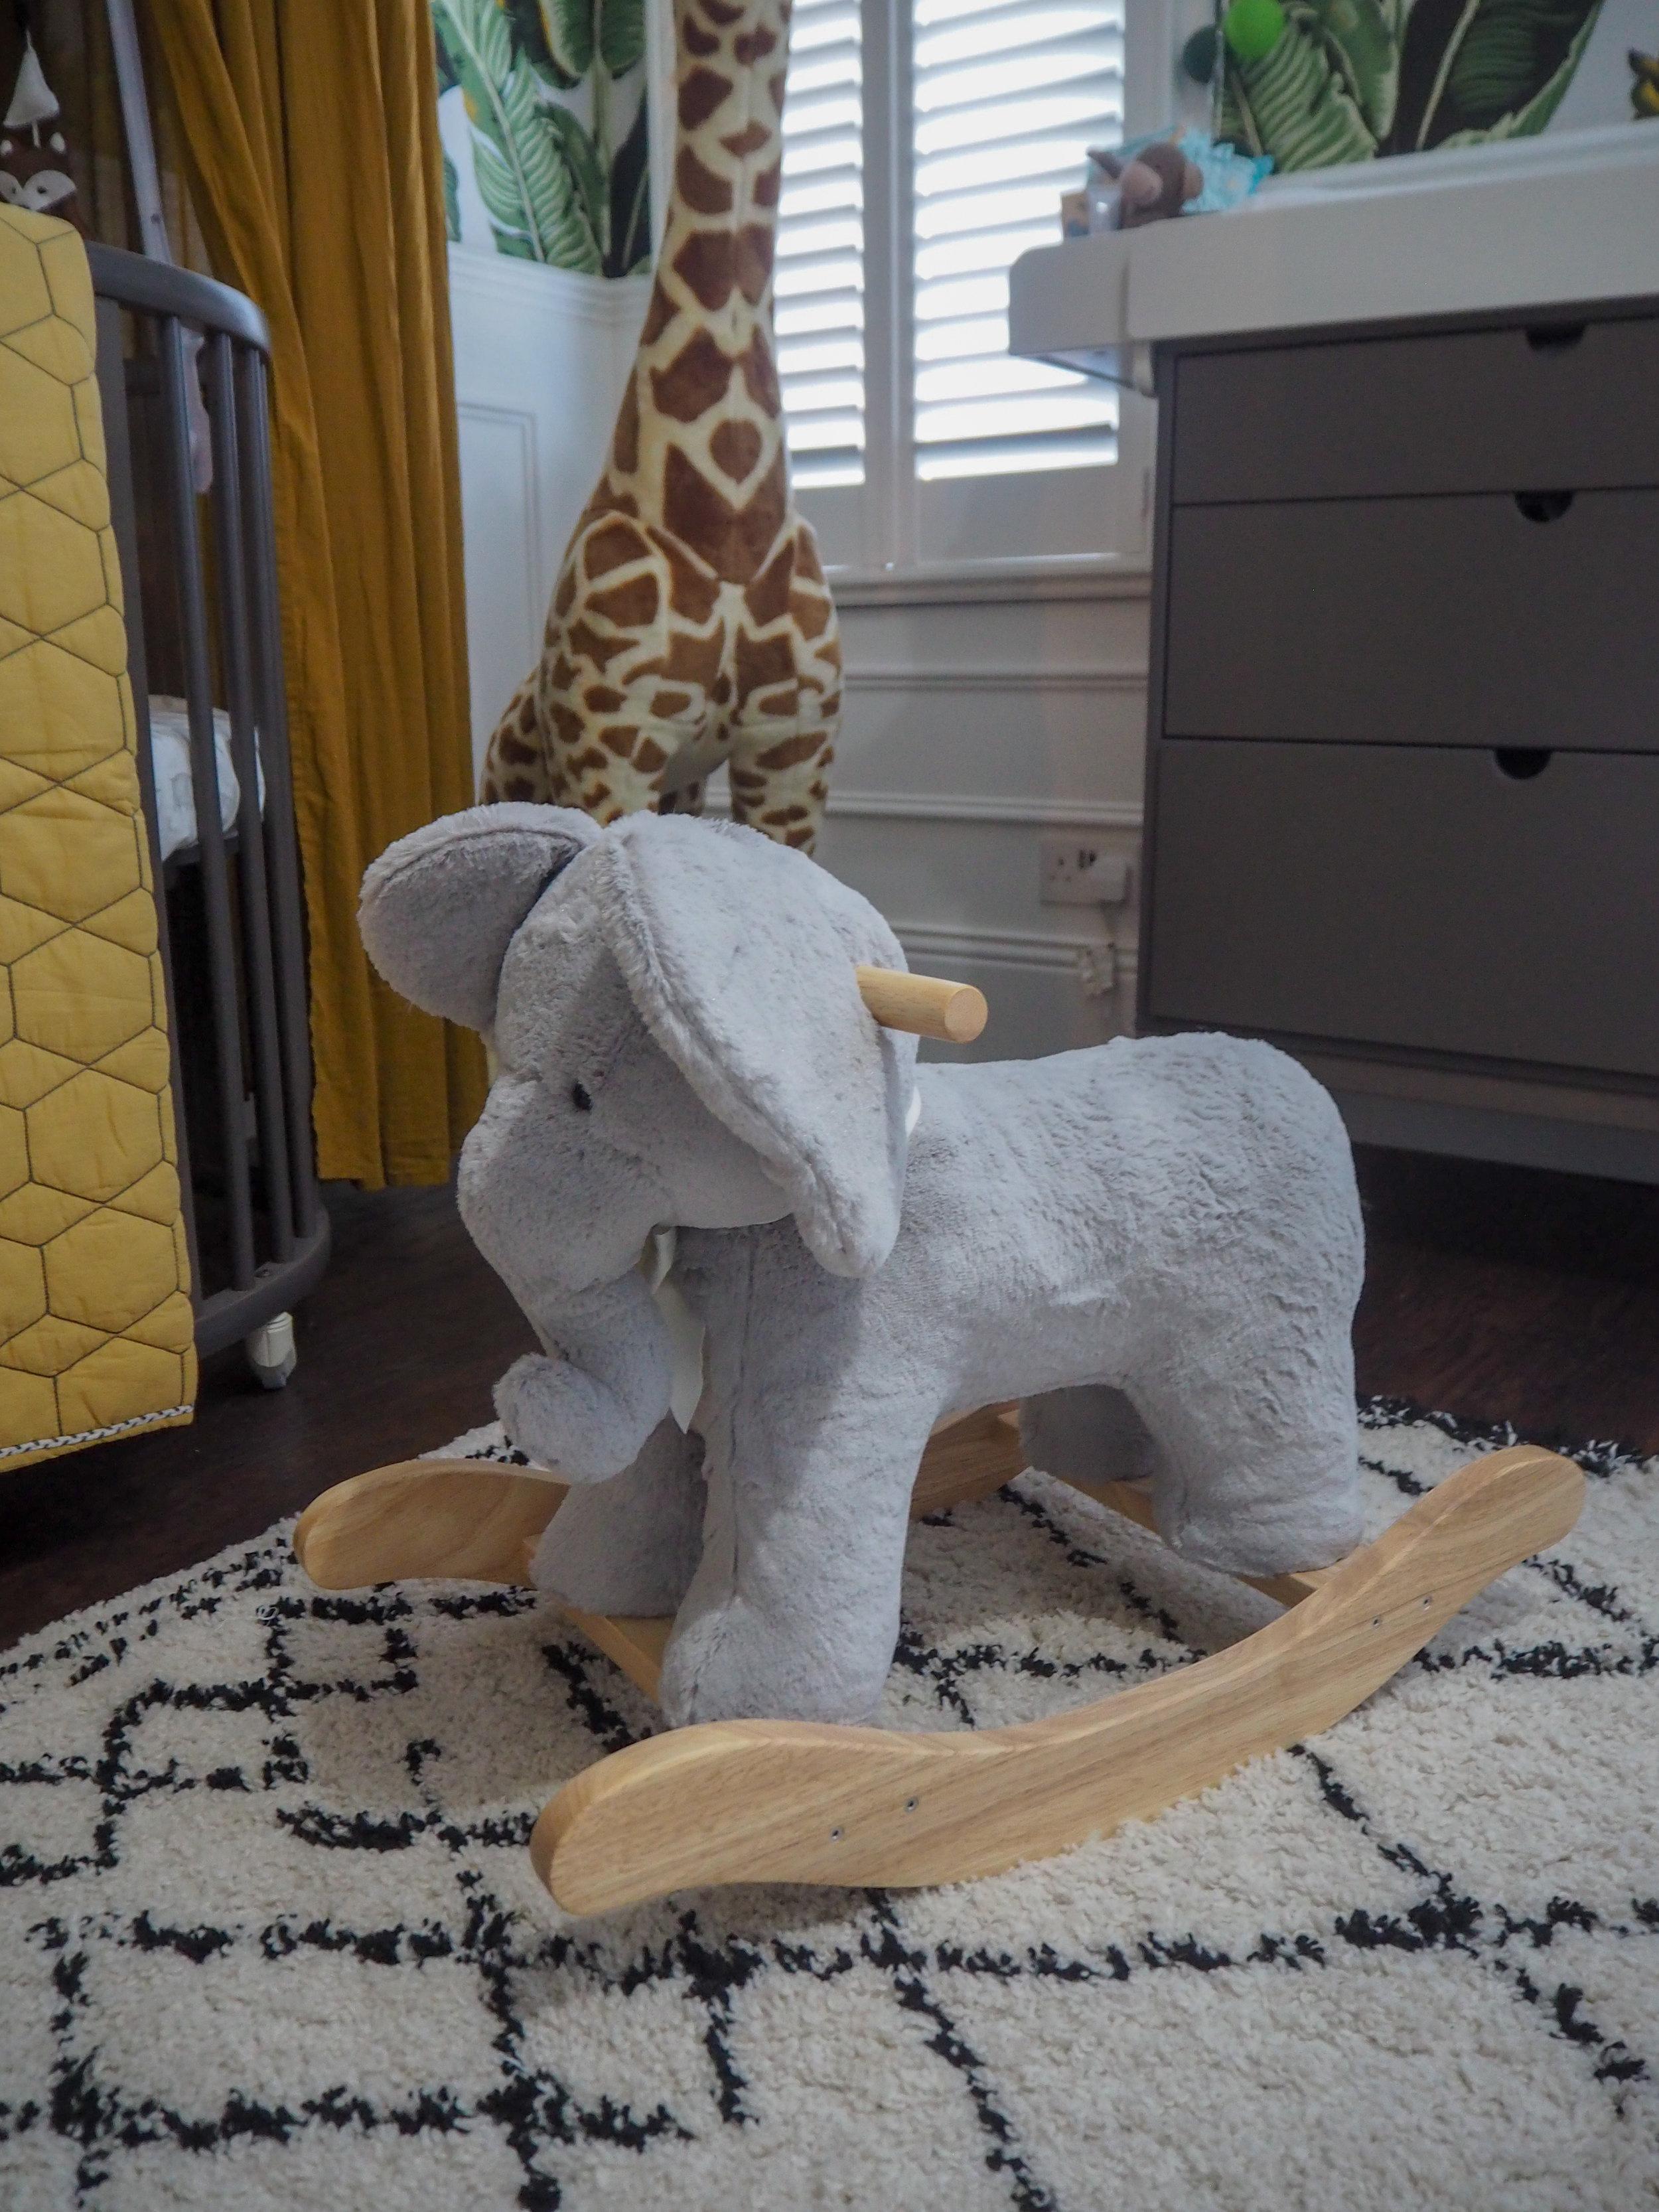 Elephant plush rocker   £149 from Pottery barn kids;   Afaw Berber Style Rug   from £269 La Redoute.